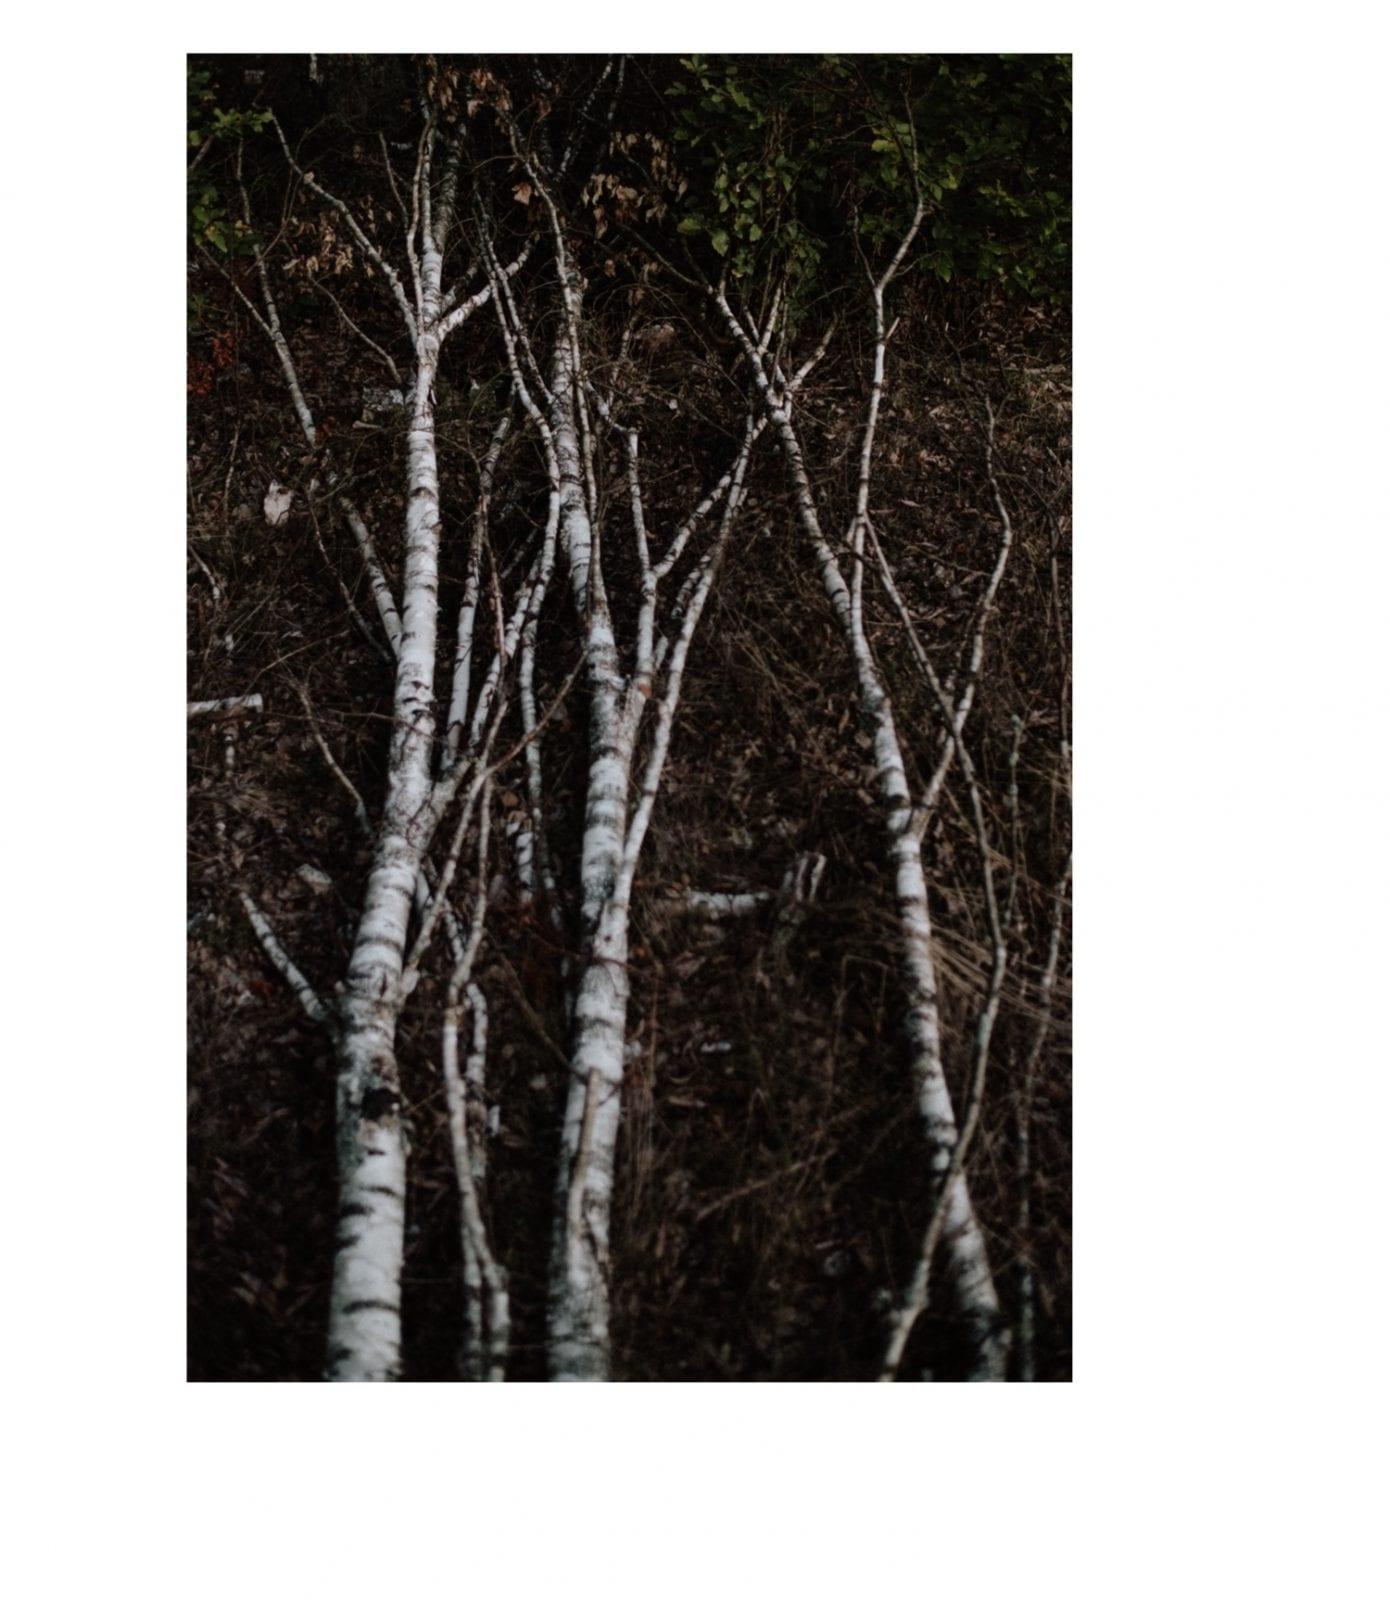 Sesja plenerowa, sesja poślubna w lesie, sesja w lesie, zdjęcia ślubne na pomoście, zdjęcia ślubne nad jeziorem Sesja poślubna w lesie